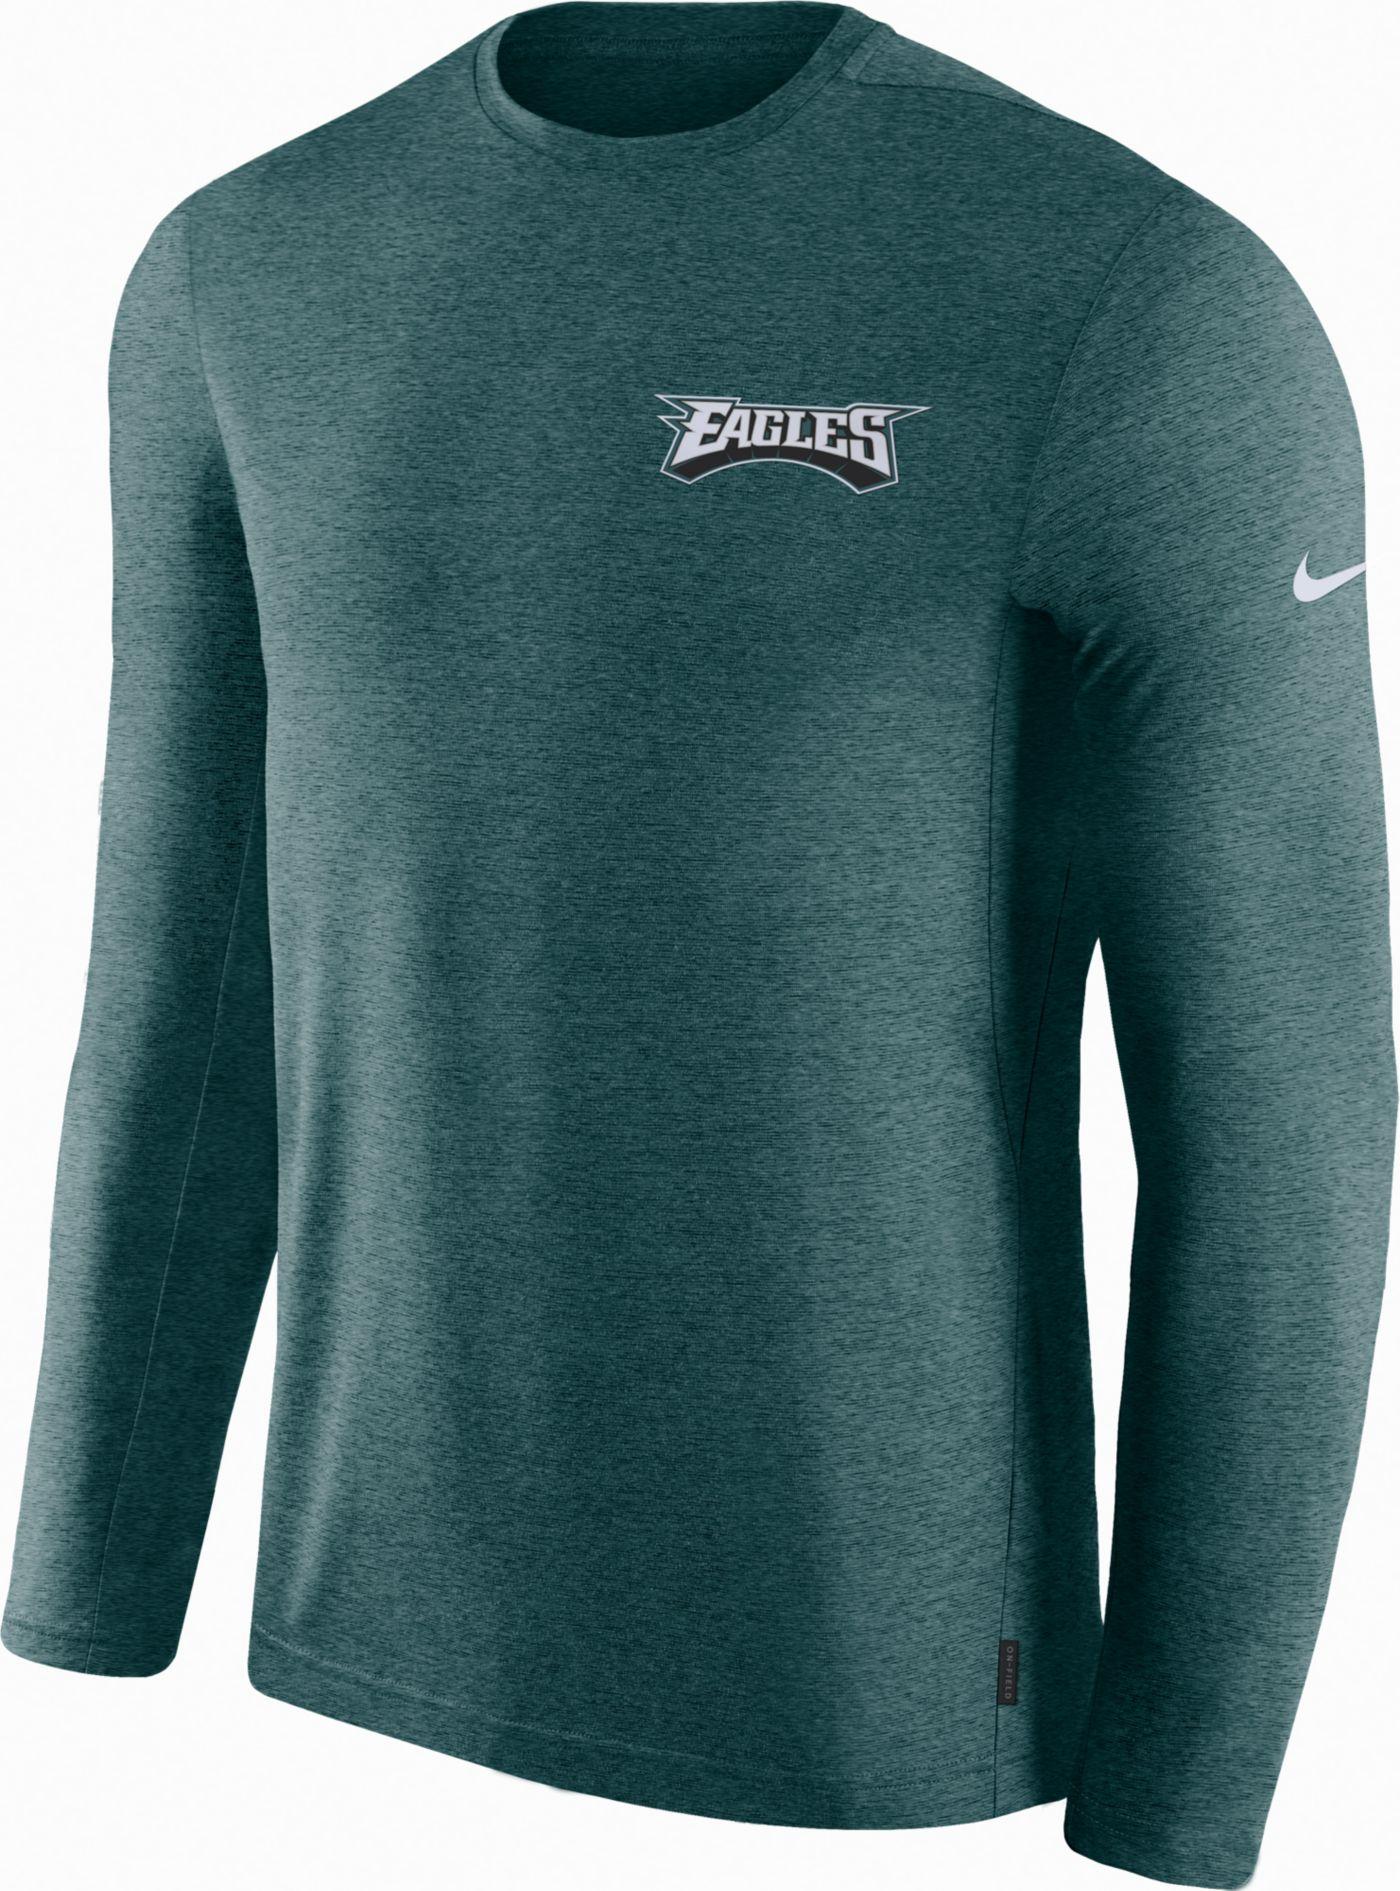 Nike Men's Philadelphia Eagles Sideline Coach Performance Green Long Sleeve Shirt